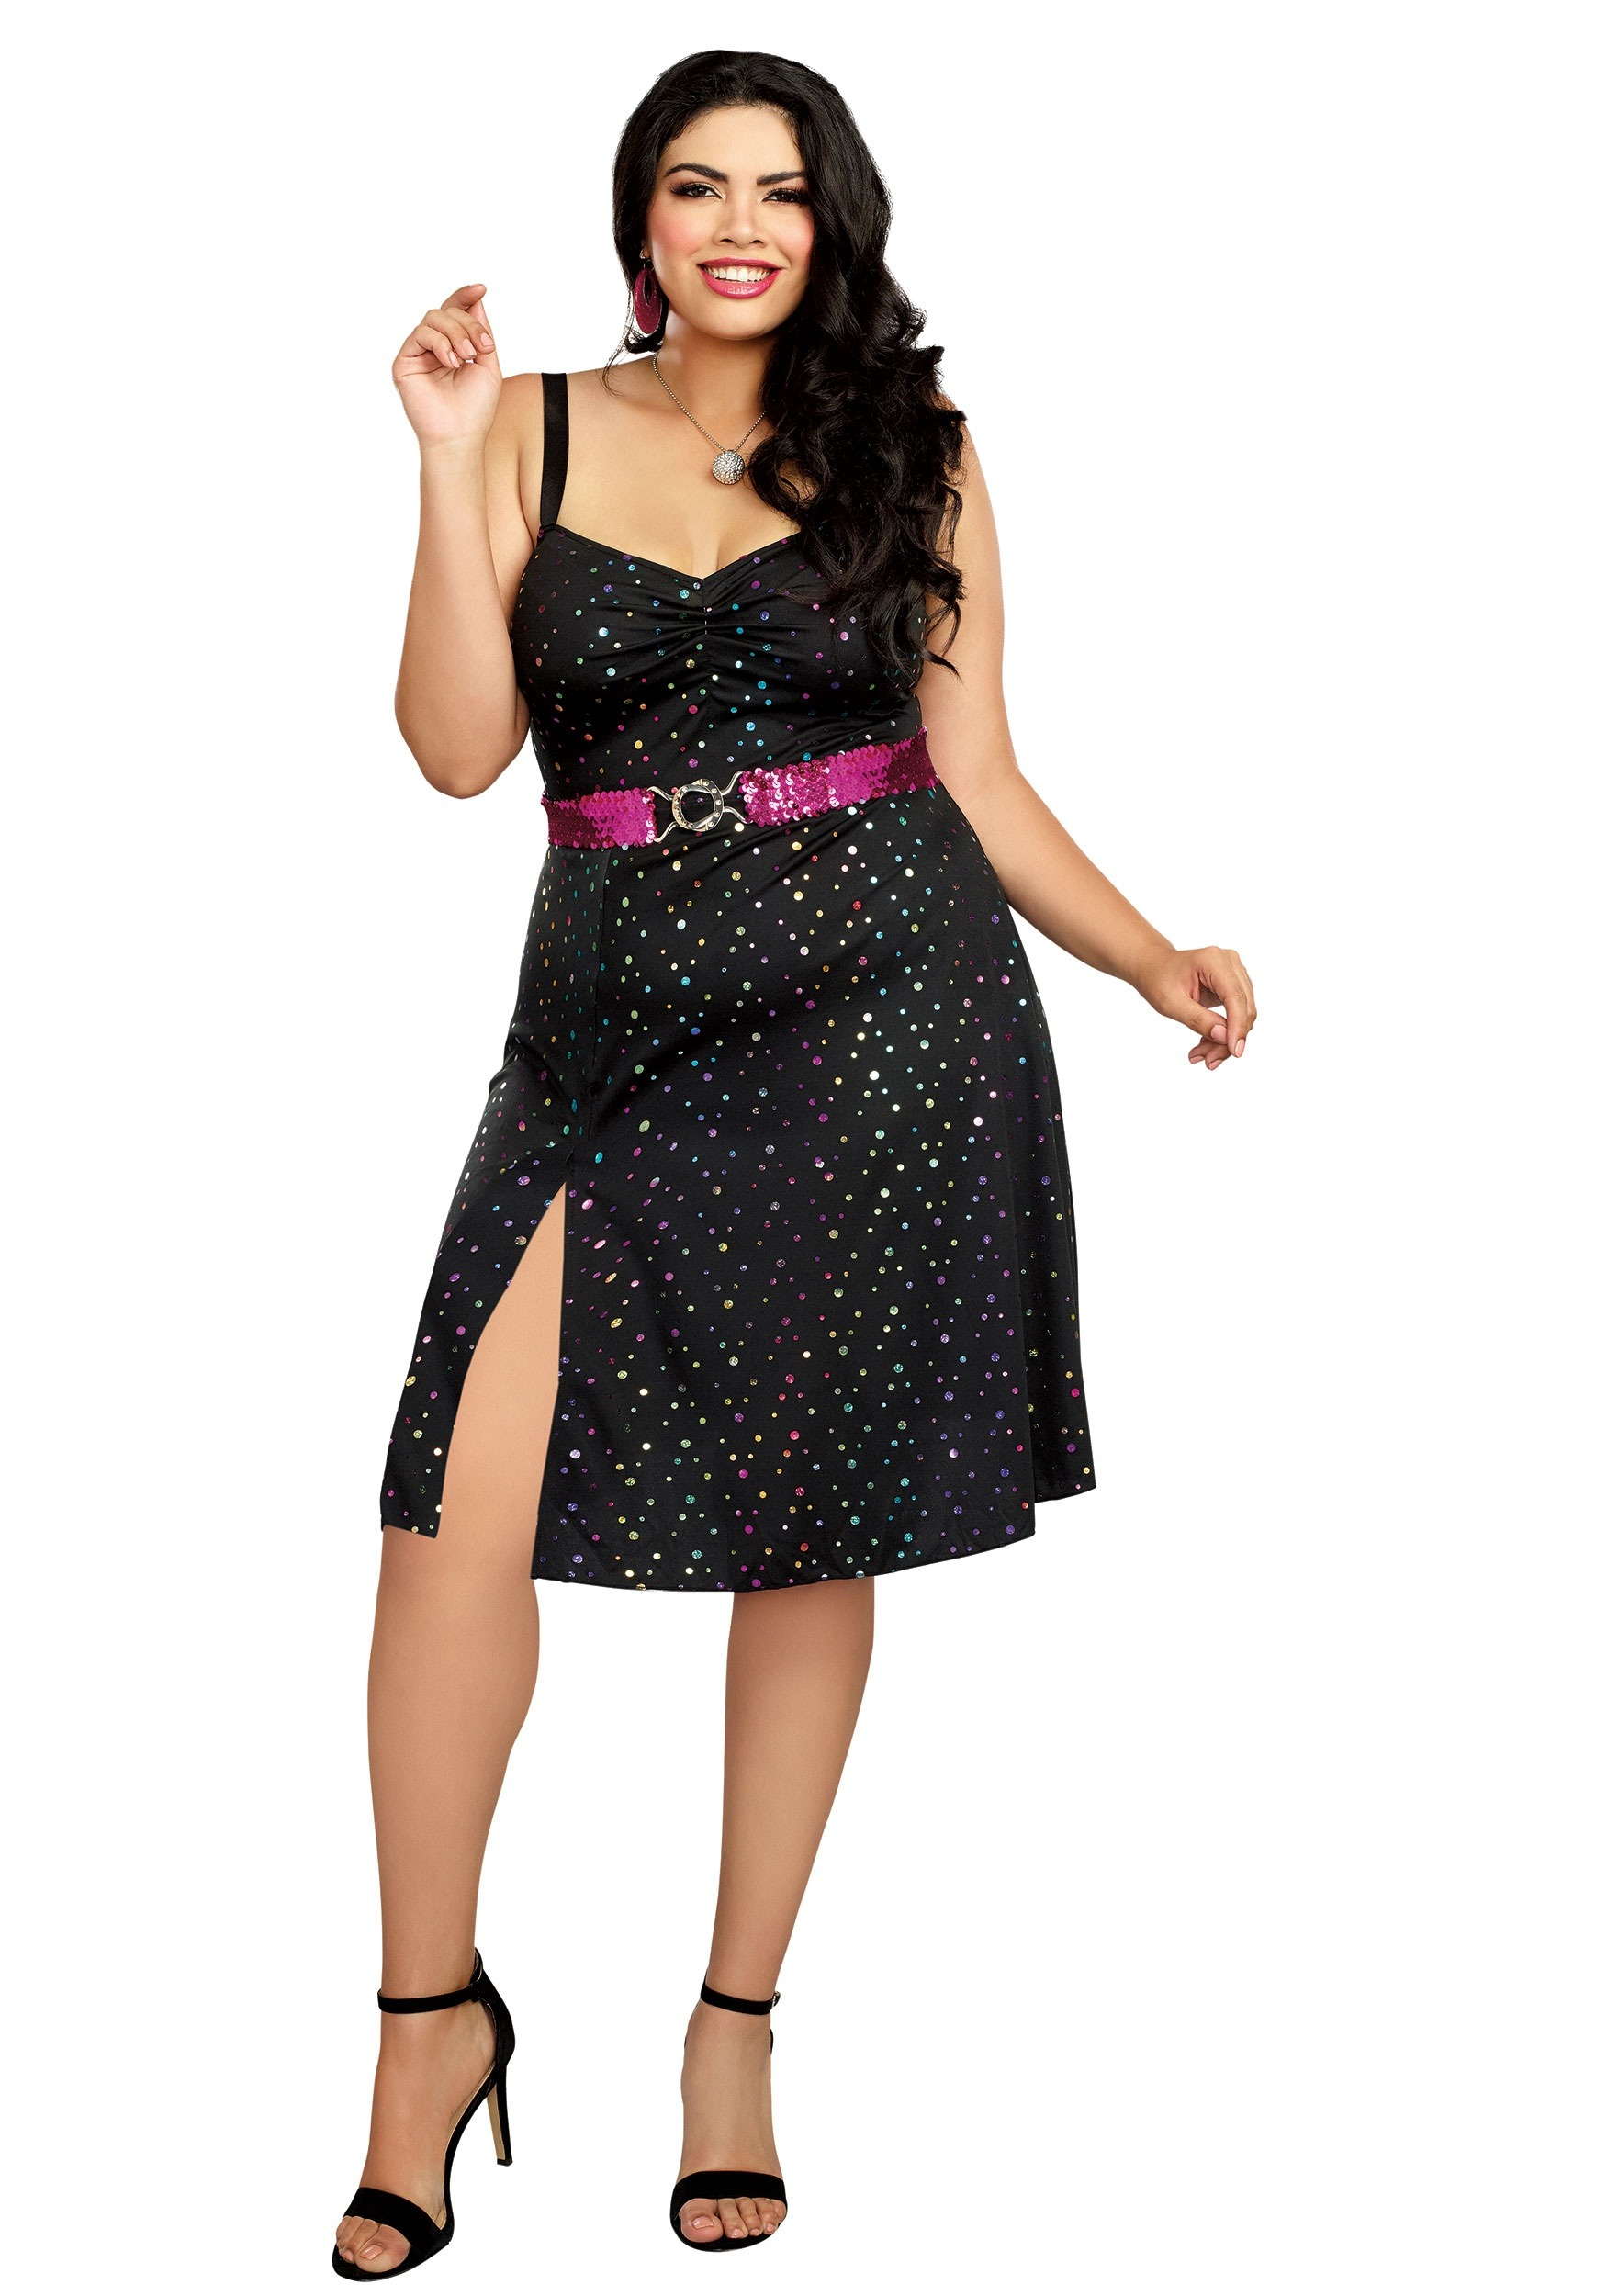 Plus Size Diva Dresses